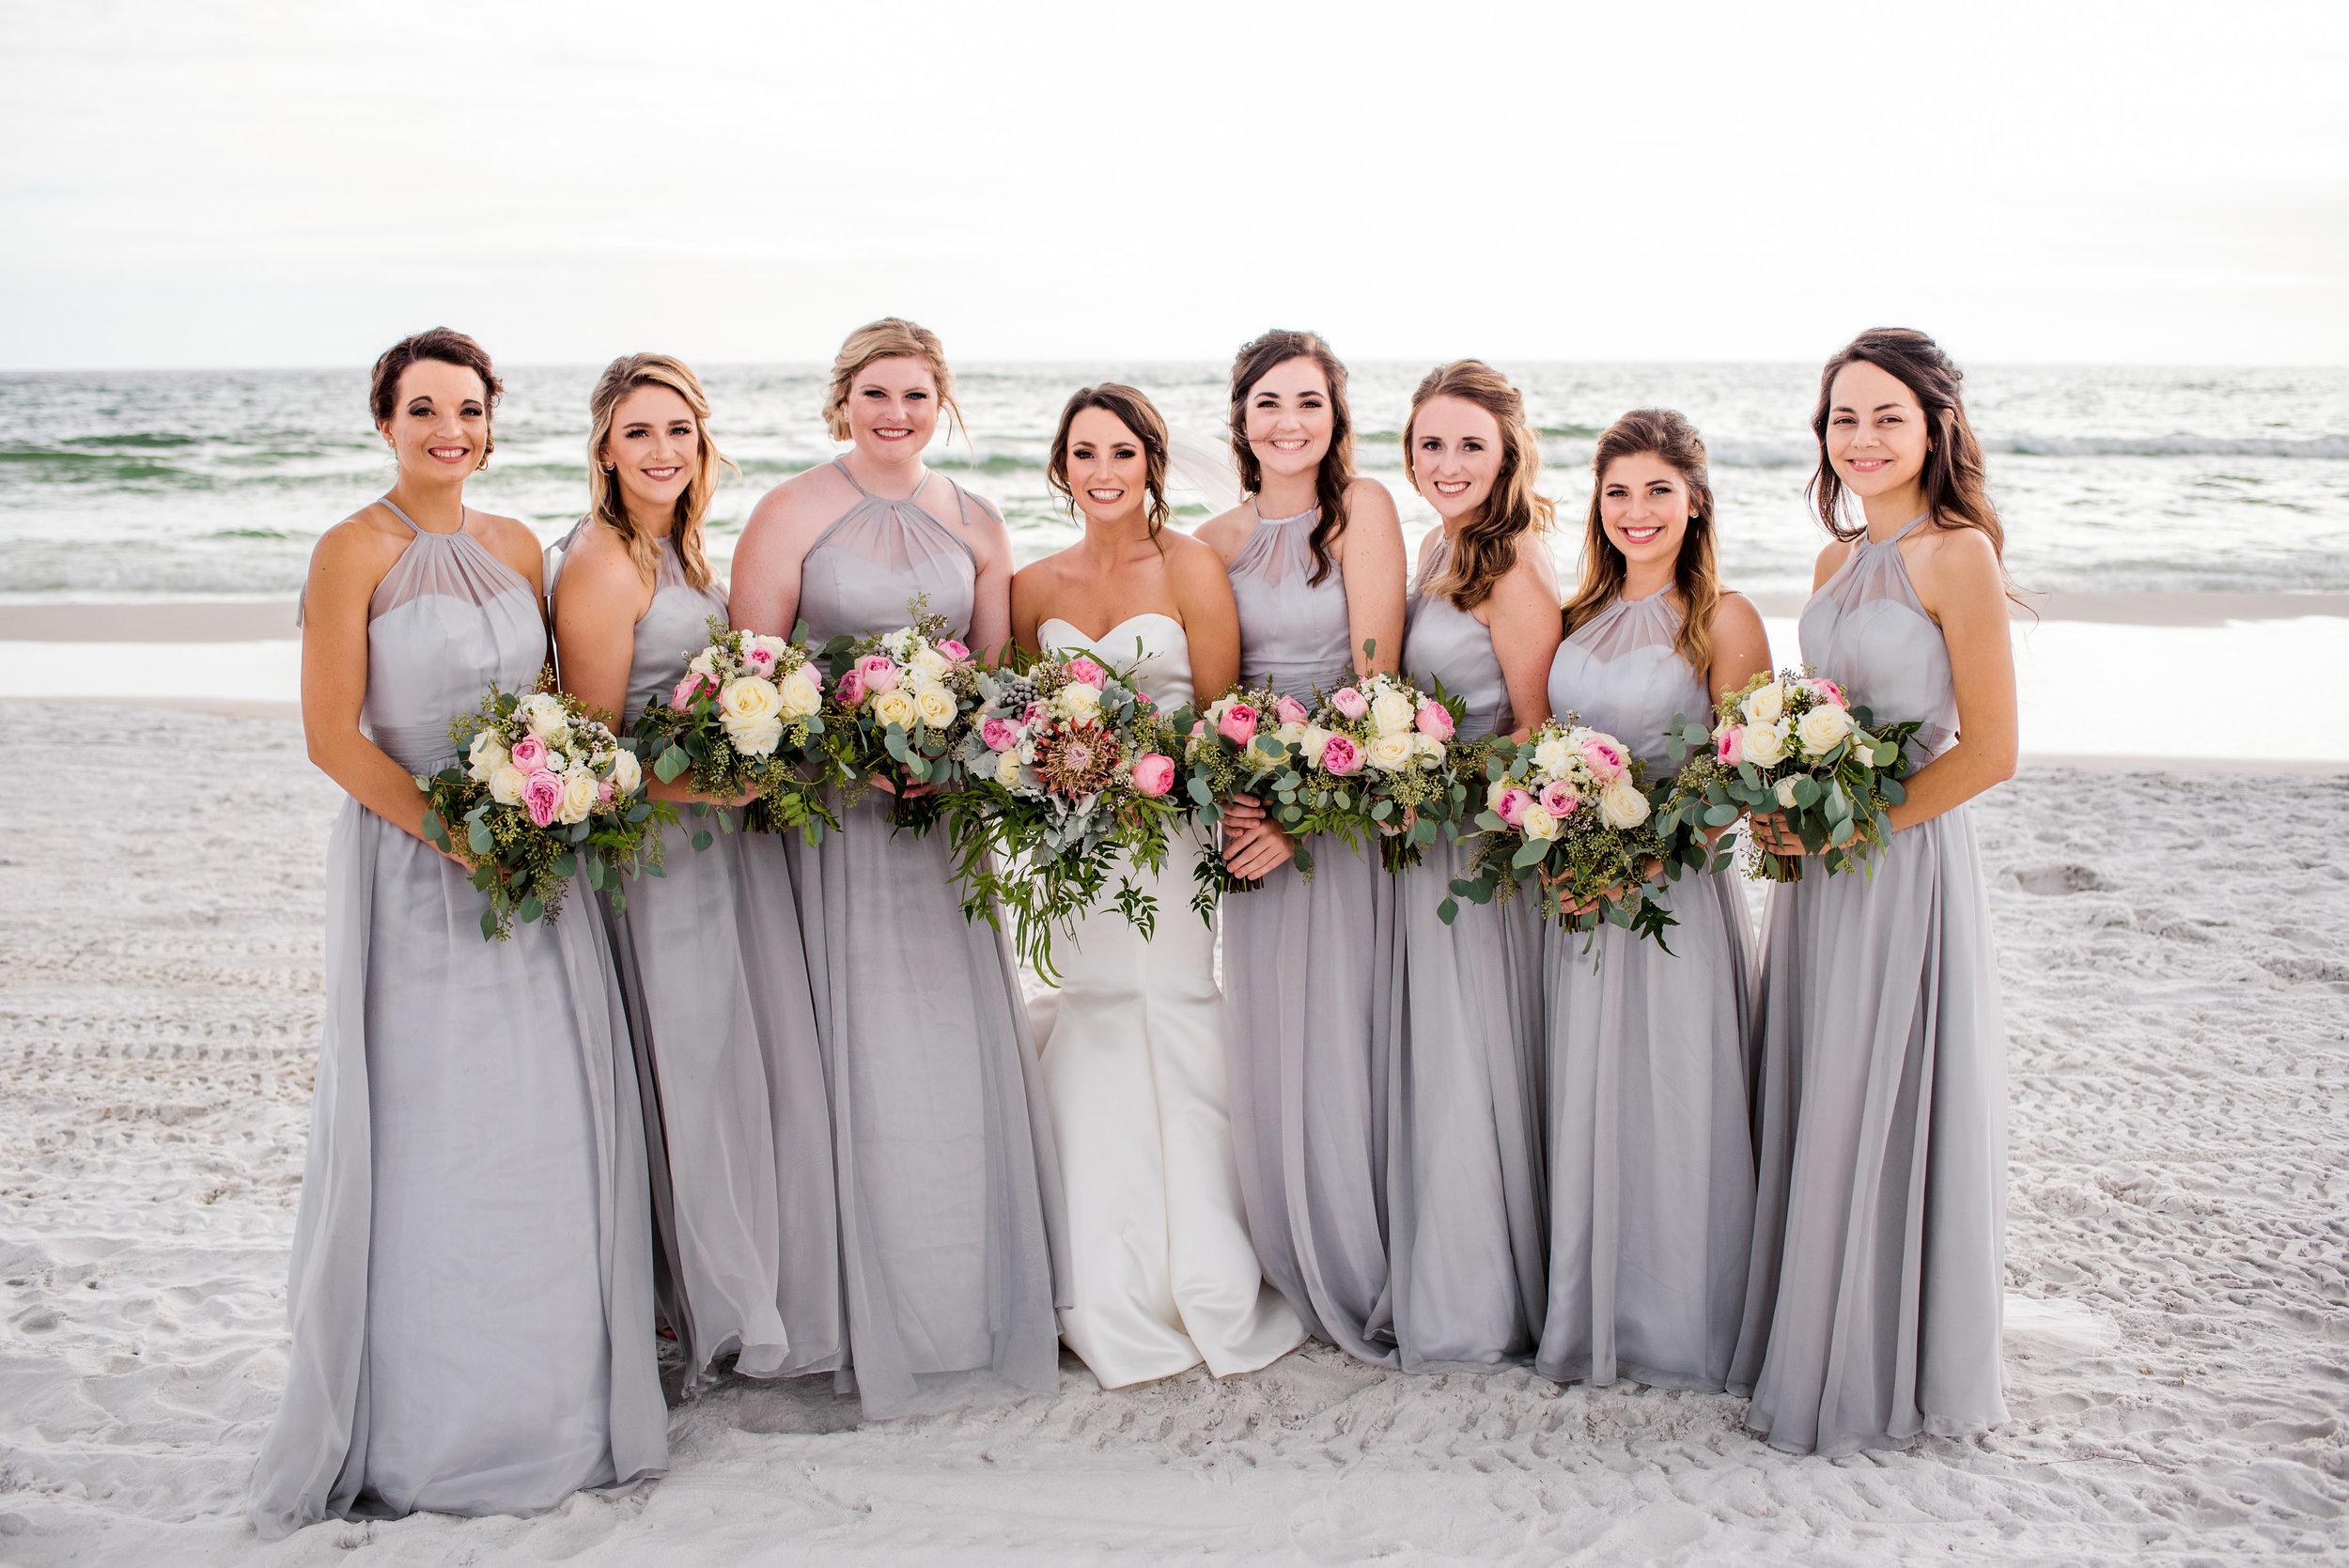 Santa Rosa Beach Wedding12.jpg